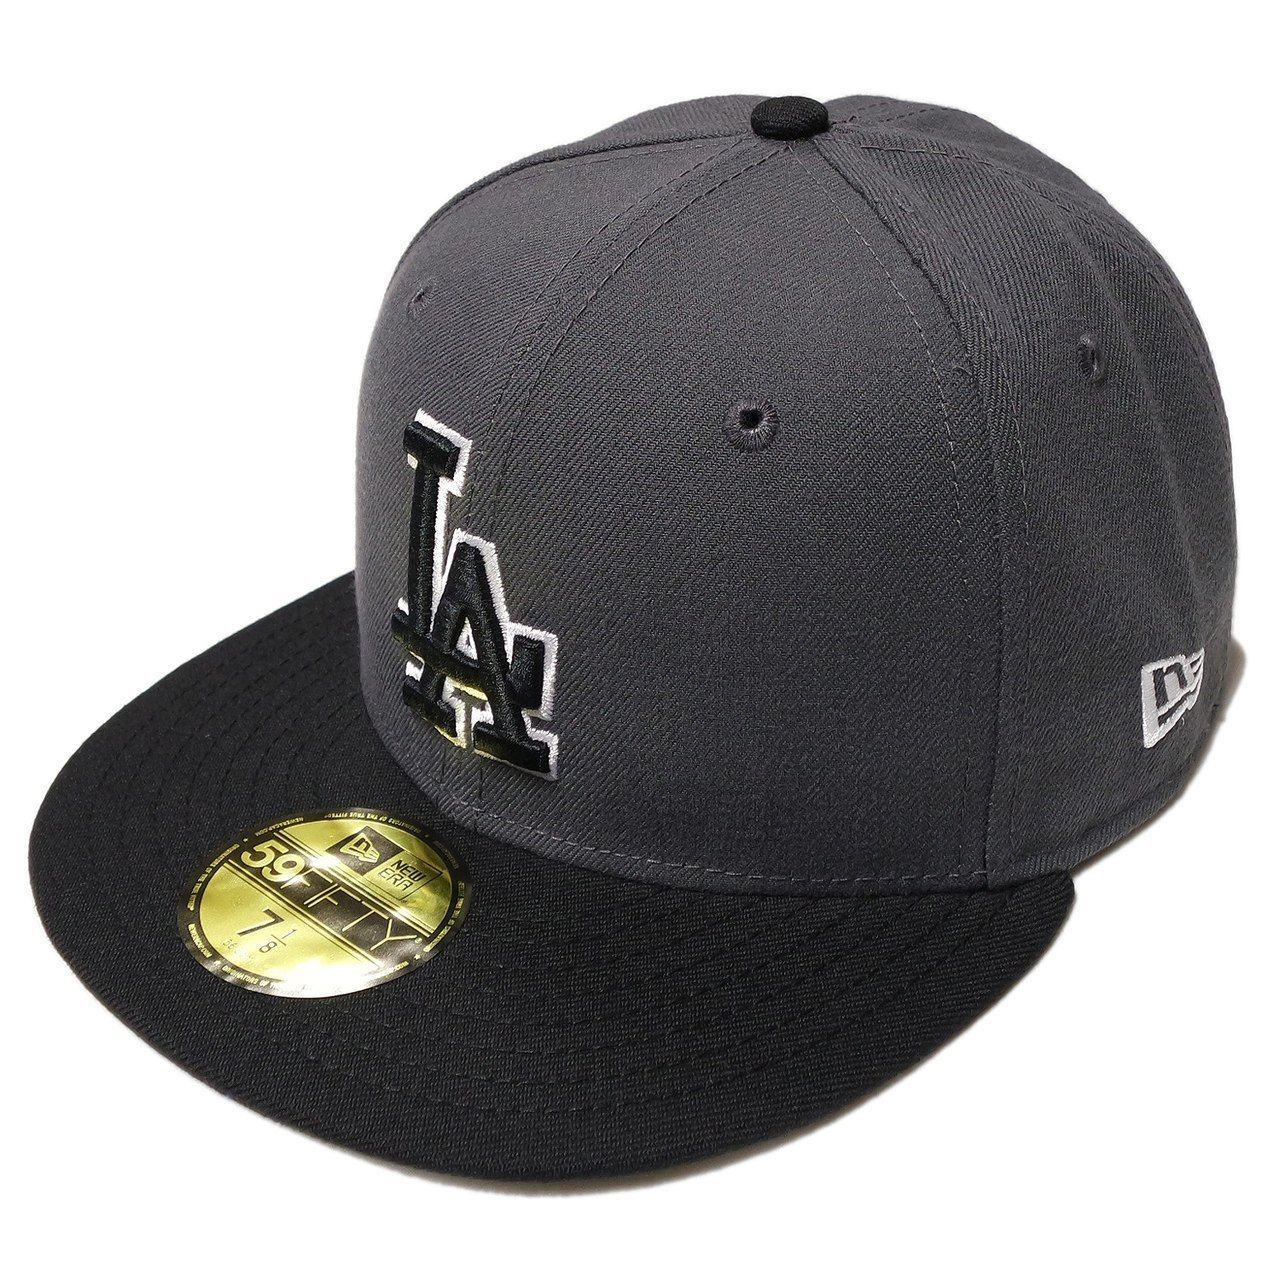 cheaper ed619 a21a3 S l1600. S l1600. Previous. New Era MLB Los Angeles Dodgers 2 Tone Dark  Gray Fitted Cap 59fifty